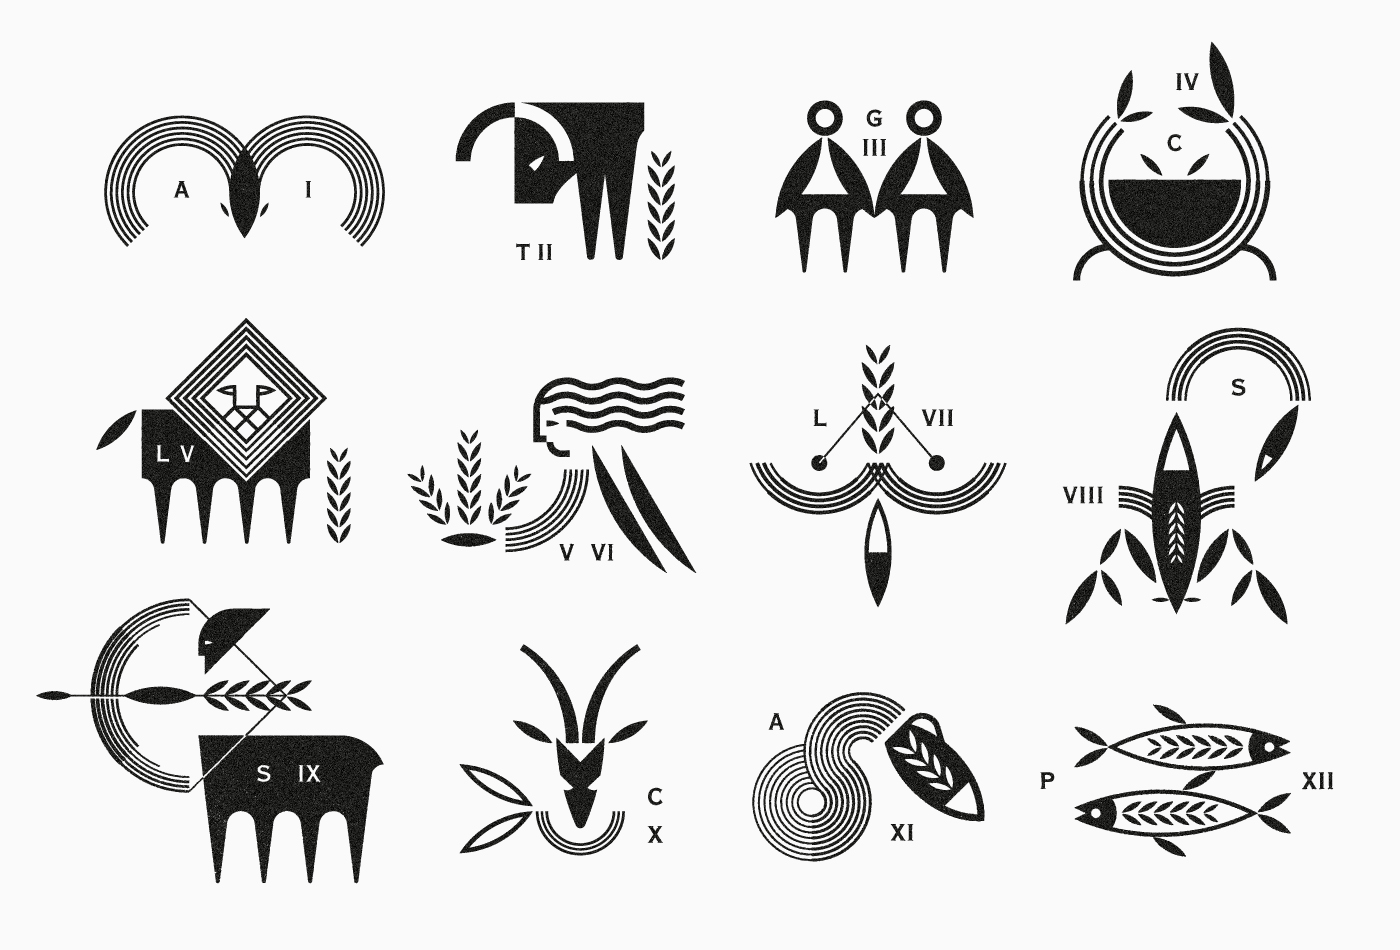 logo-logos-marks-vacaliebres-zodiac-greek-symbols.logomarks